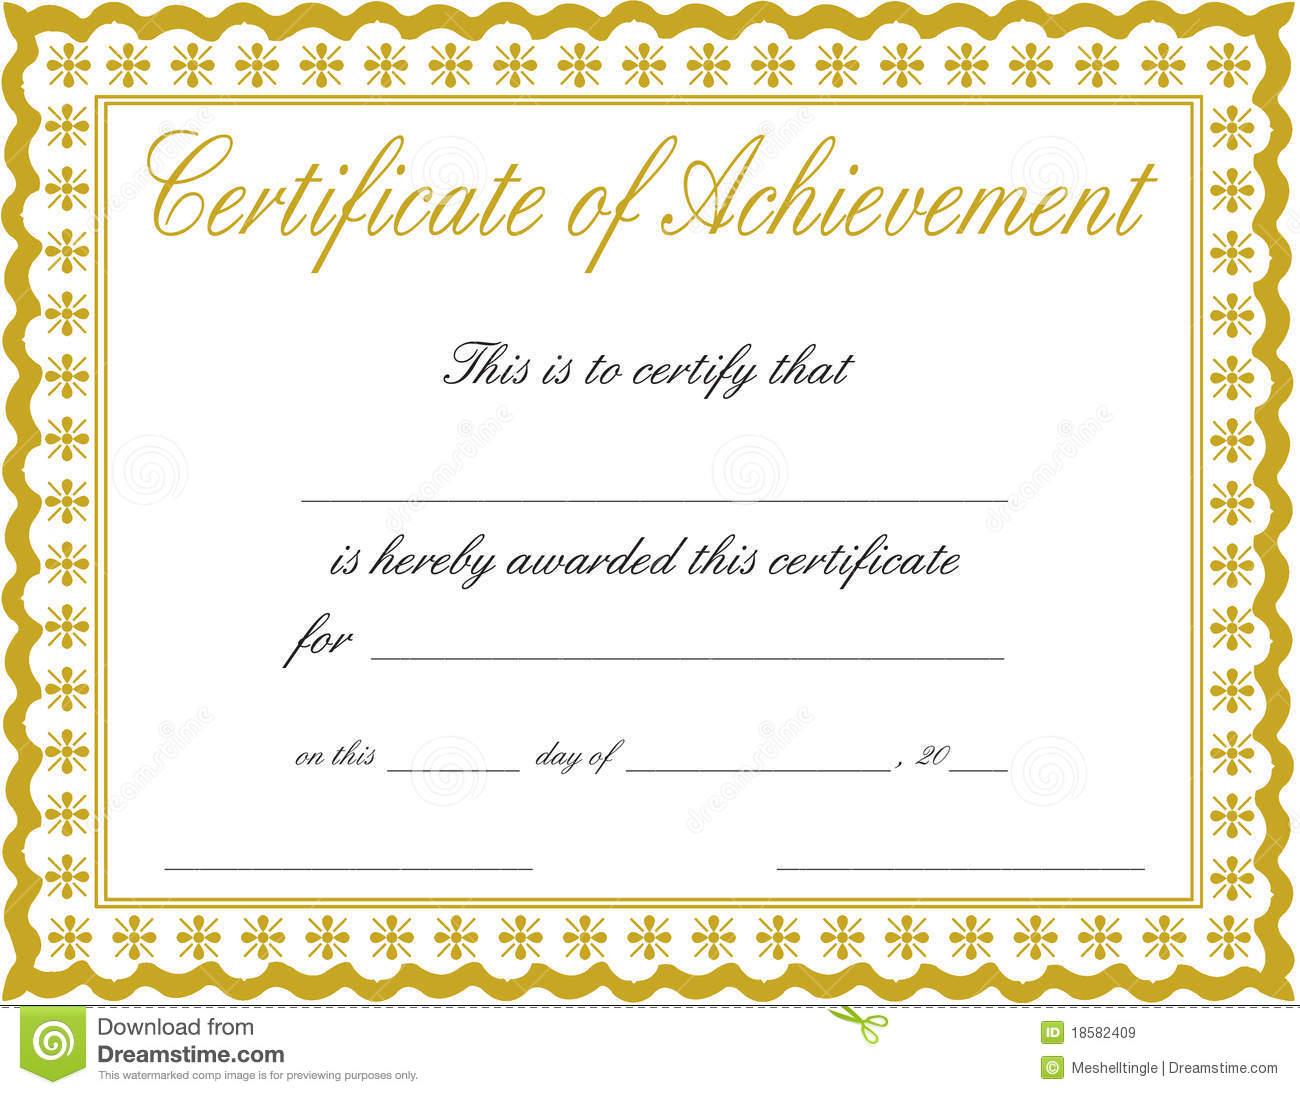 Certificate-Achievement-Printable-Doc-Pdf- - Free Printable Certificates Of Achievement